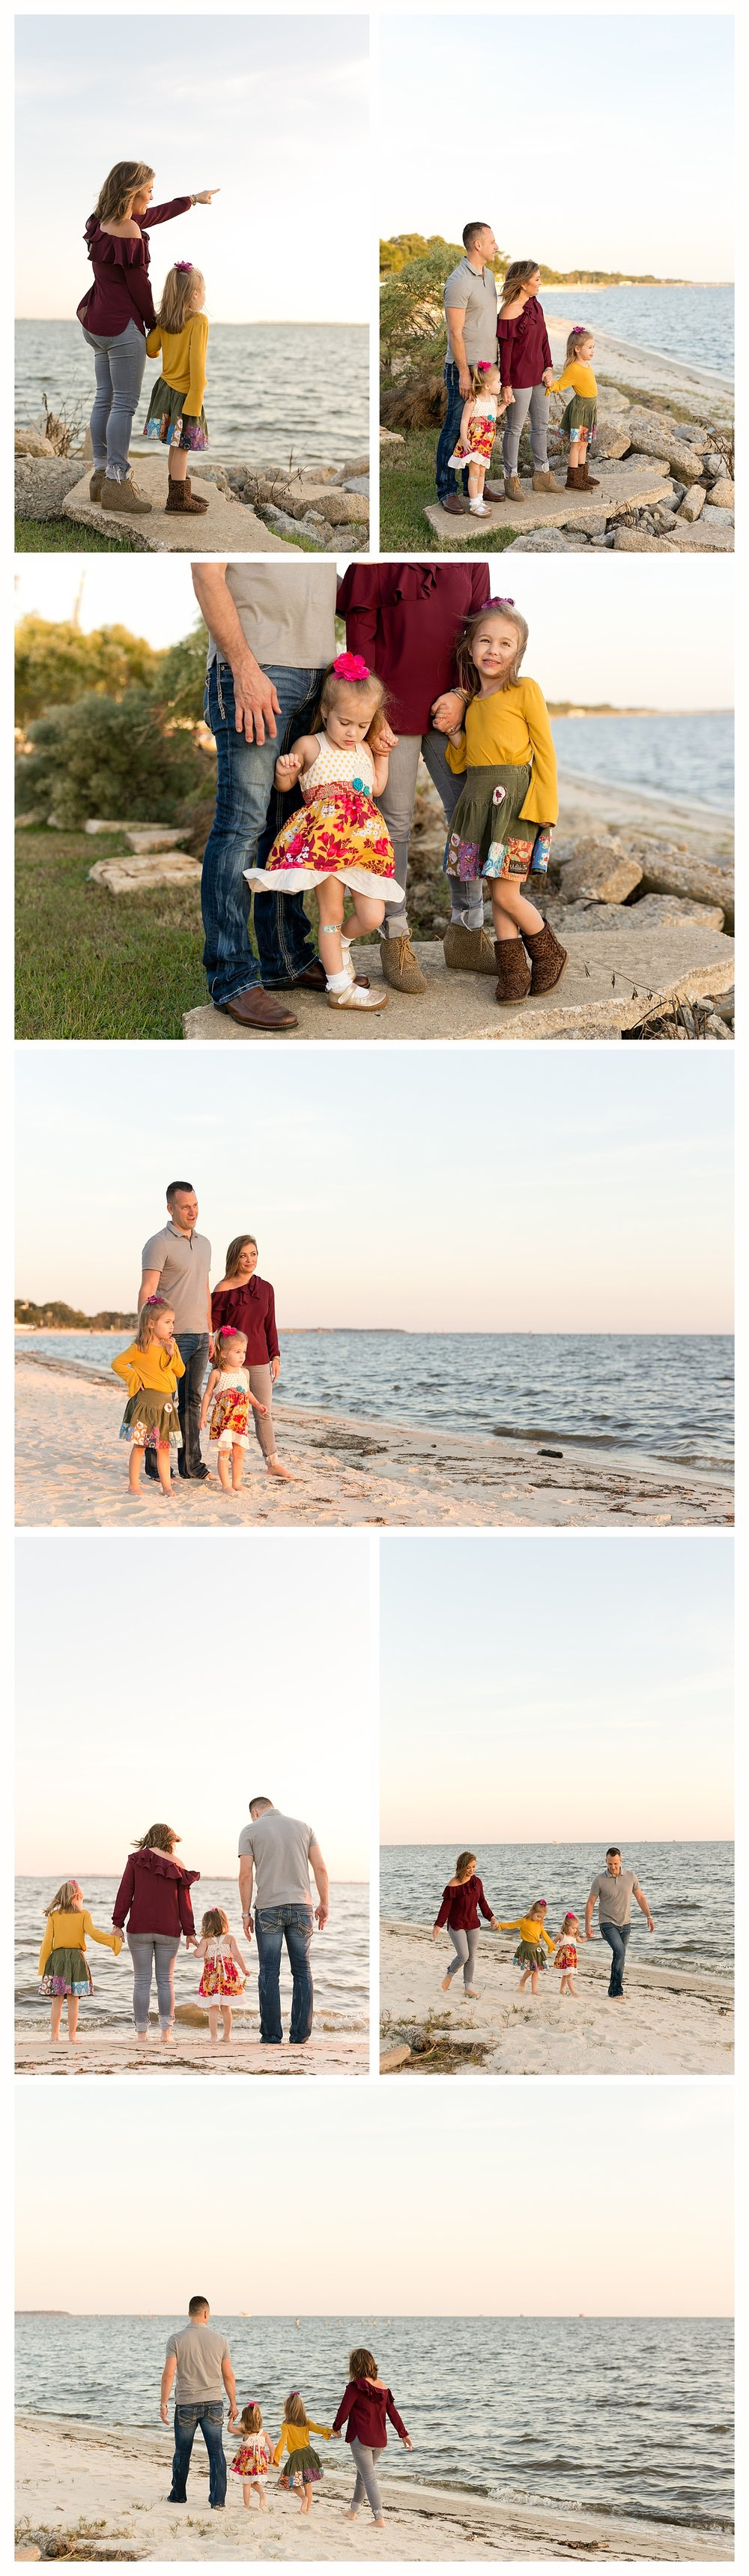 Ocean Springs family photographer - family photos on Front Beach, Ocean Springs, Mississippi